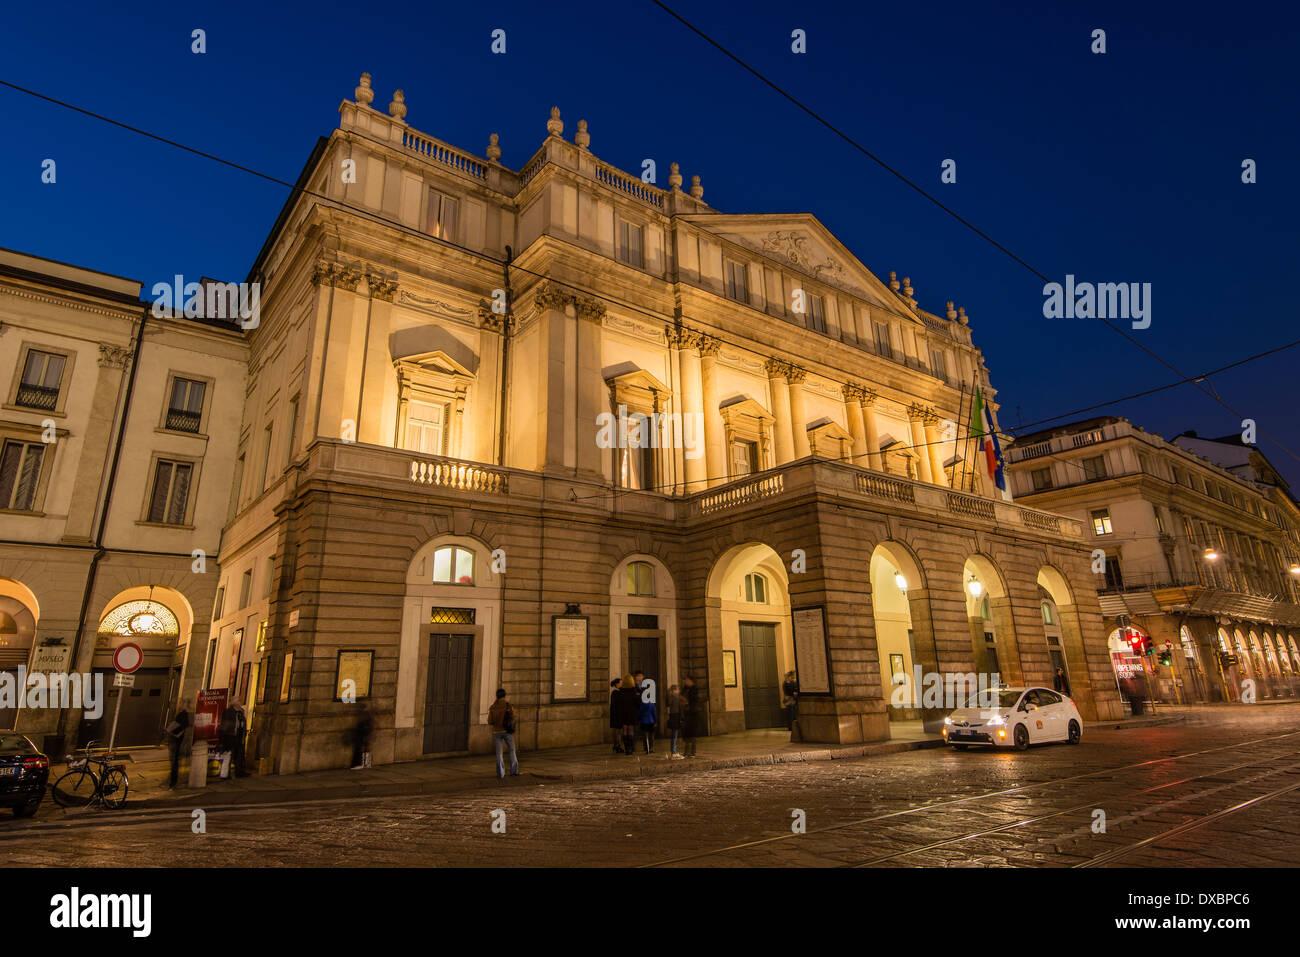 Night view of La Scala opera theatre, Milan, Lombardy, Italy - Stock Image